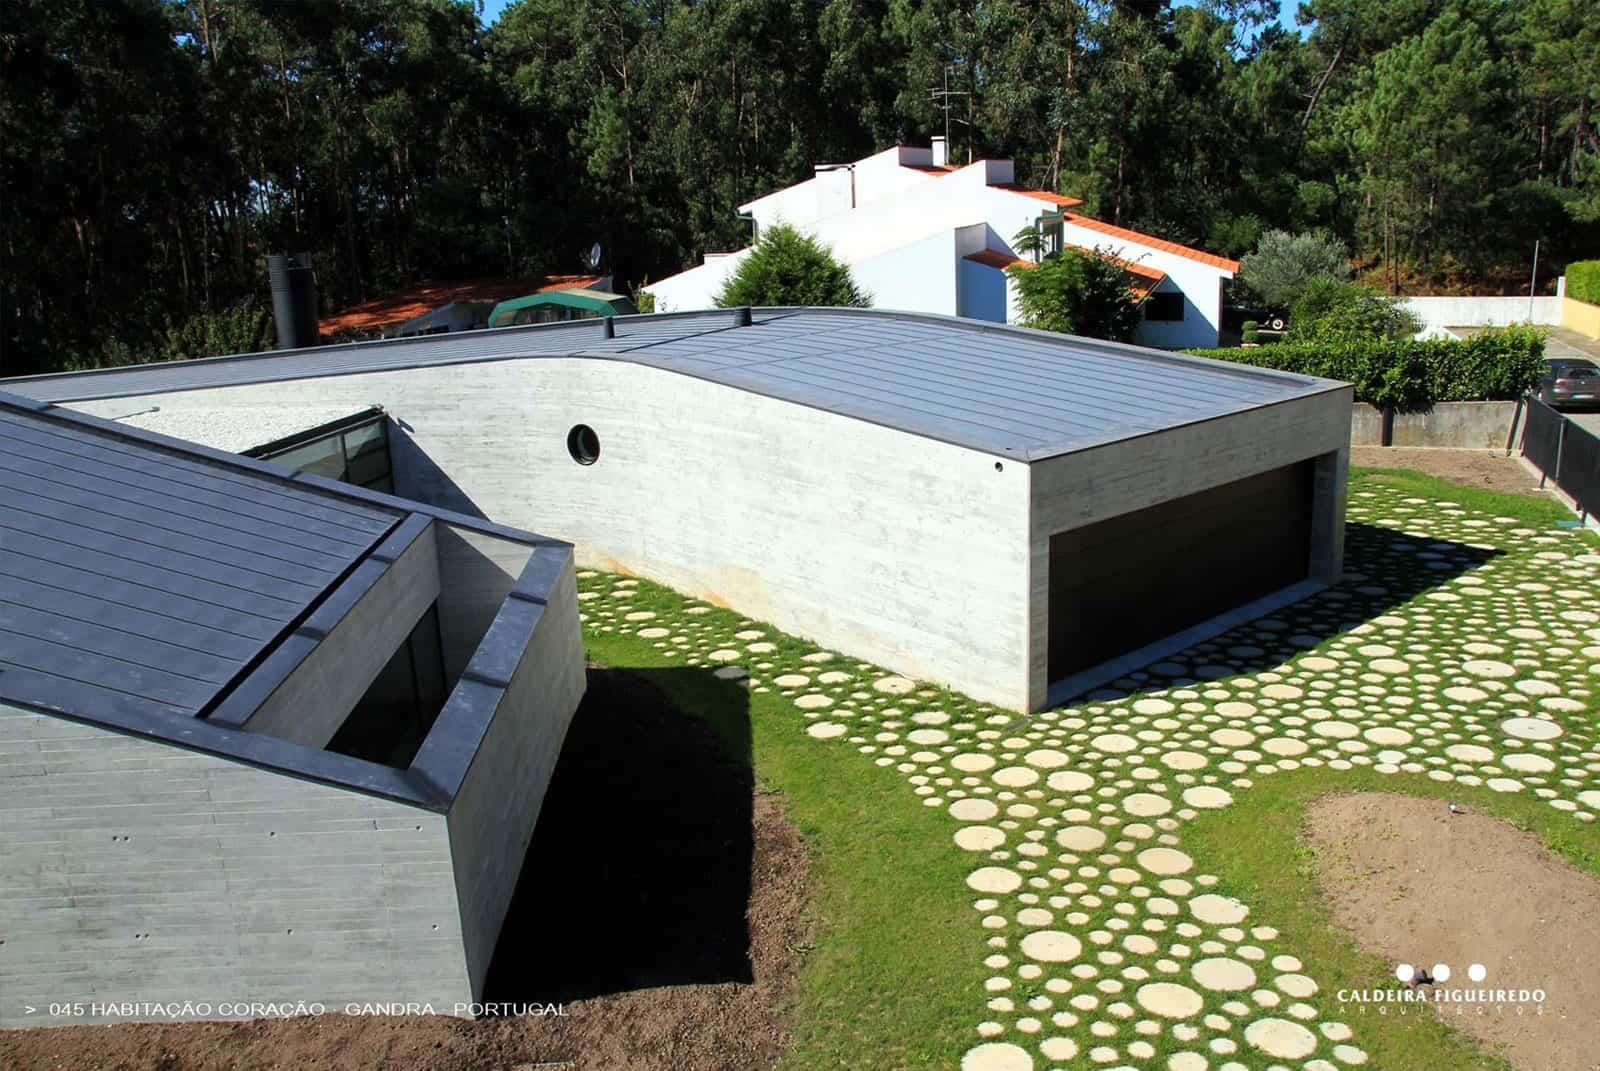 Habitaçao Coraçao by Caldeira Figueiredo